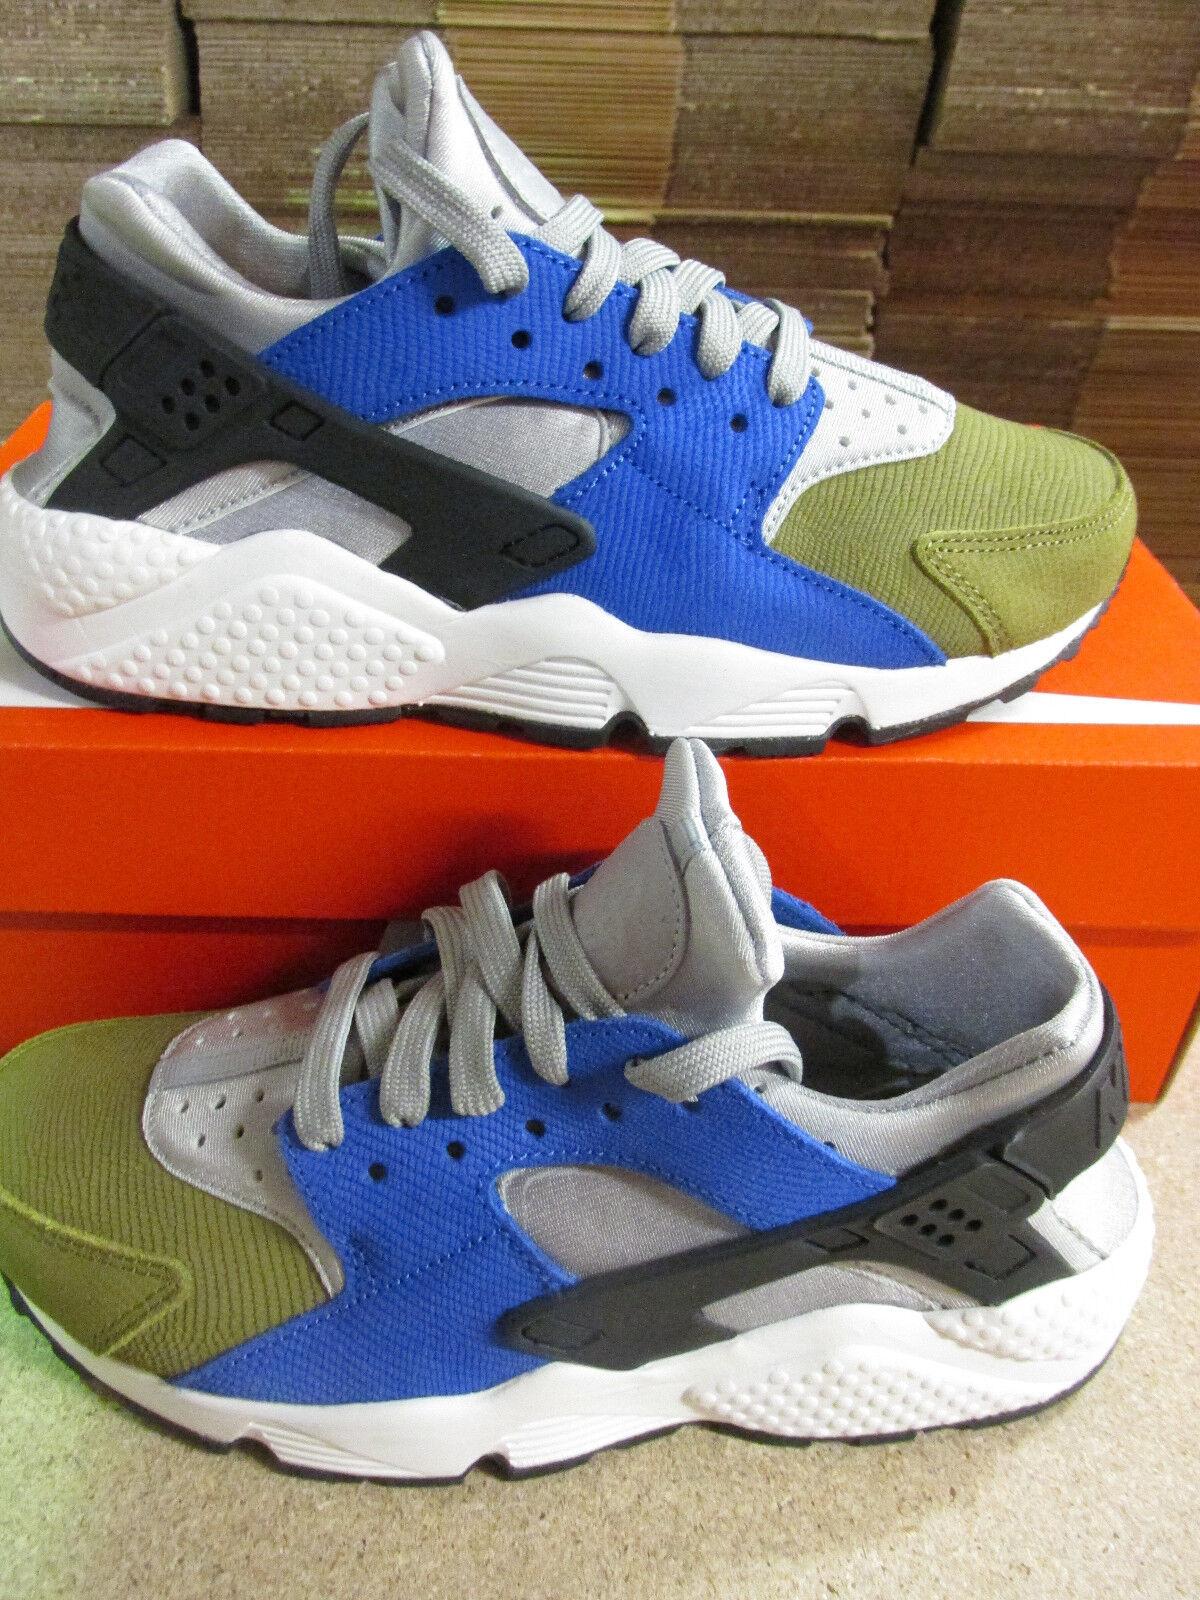 nike womens air huarache run PRM trainers 683818 007 sneakers shoes